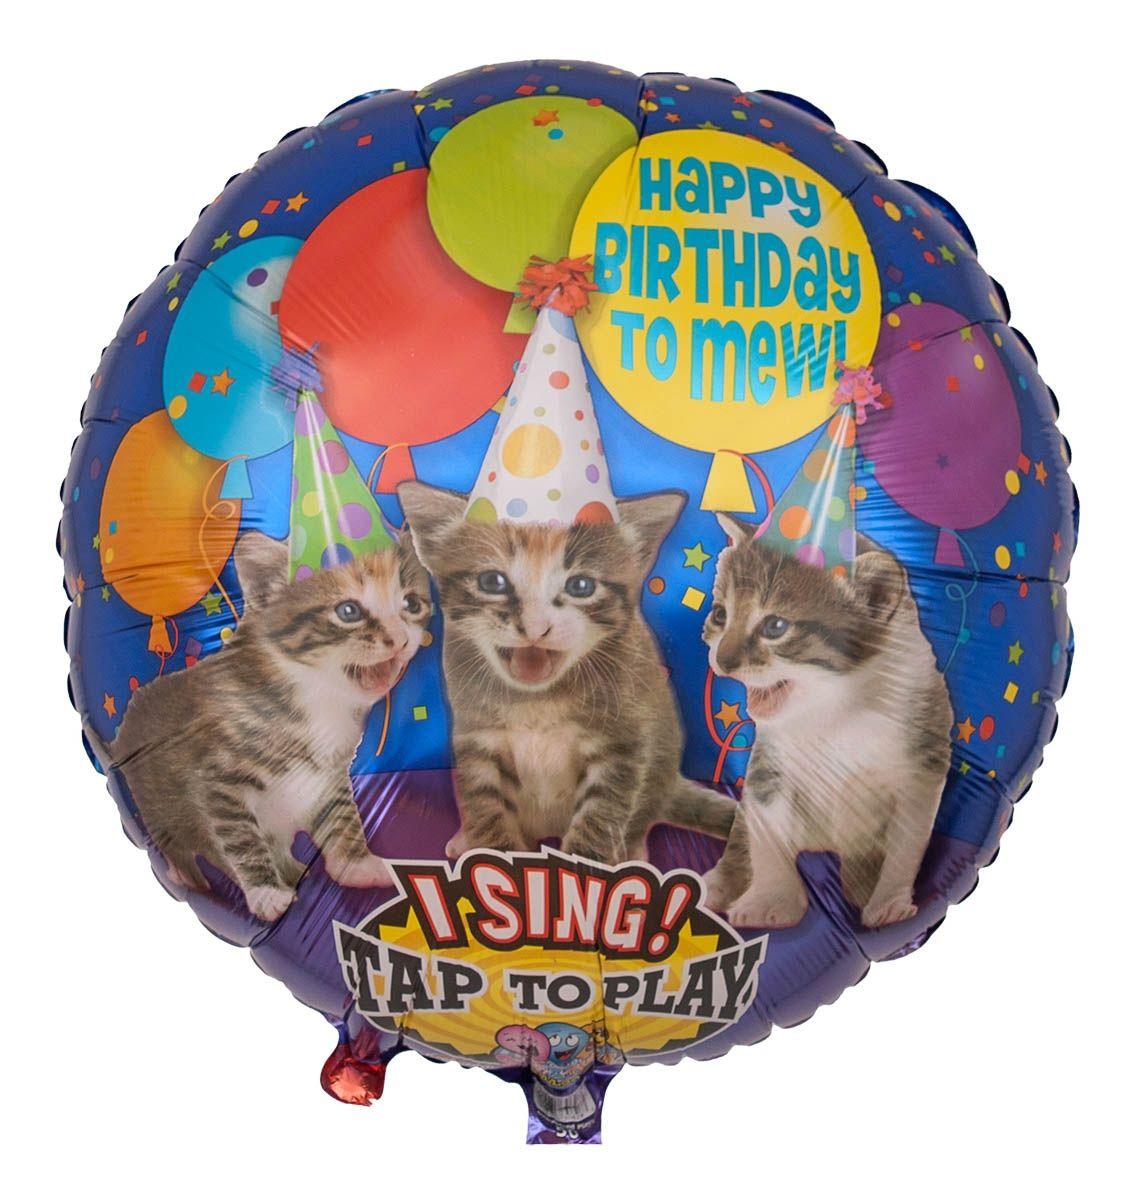 Musikballon Miauende Katzen Zum Geburtstag 71cm Musikballons